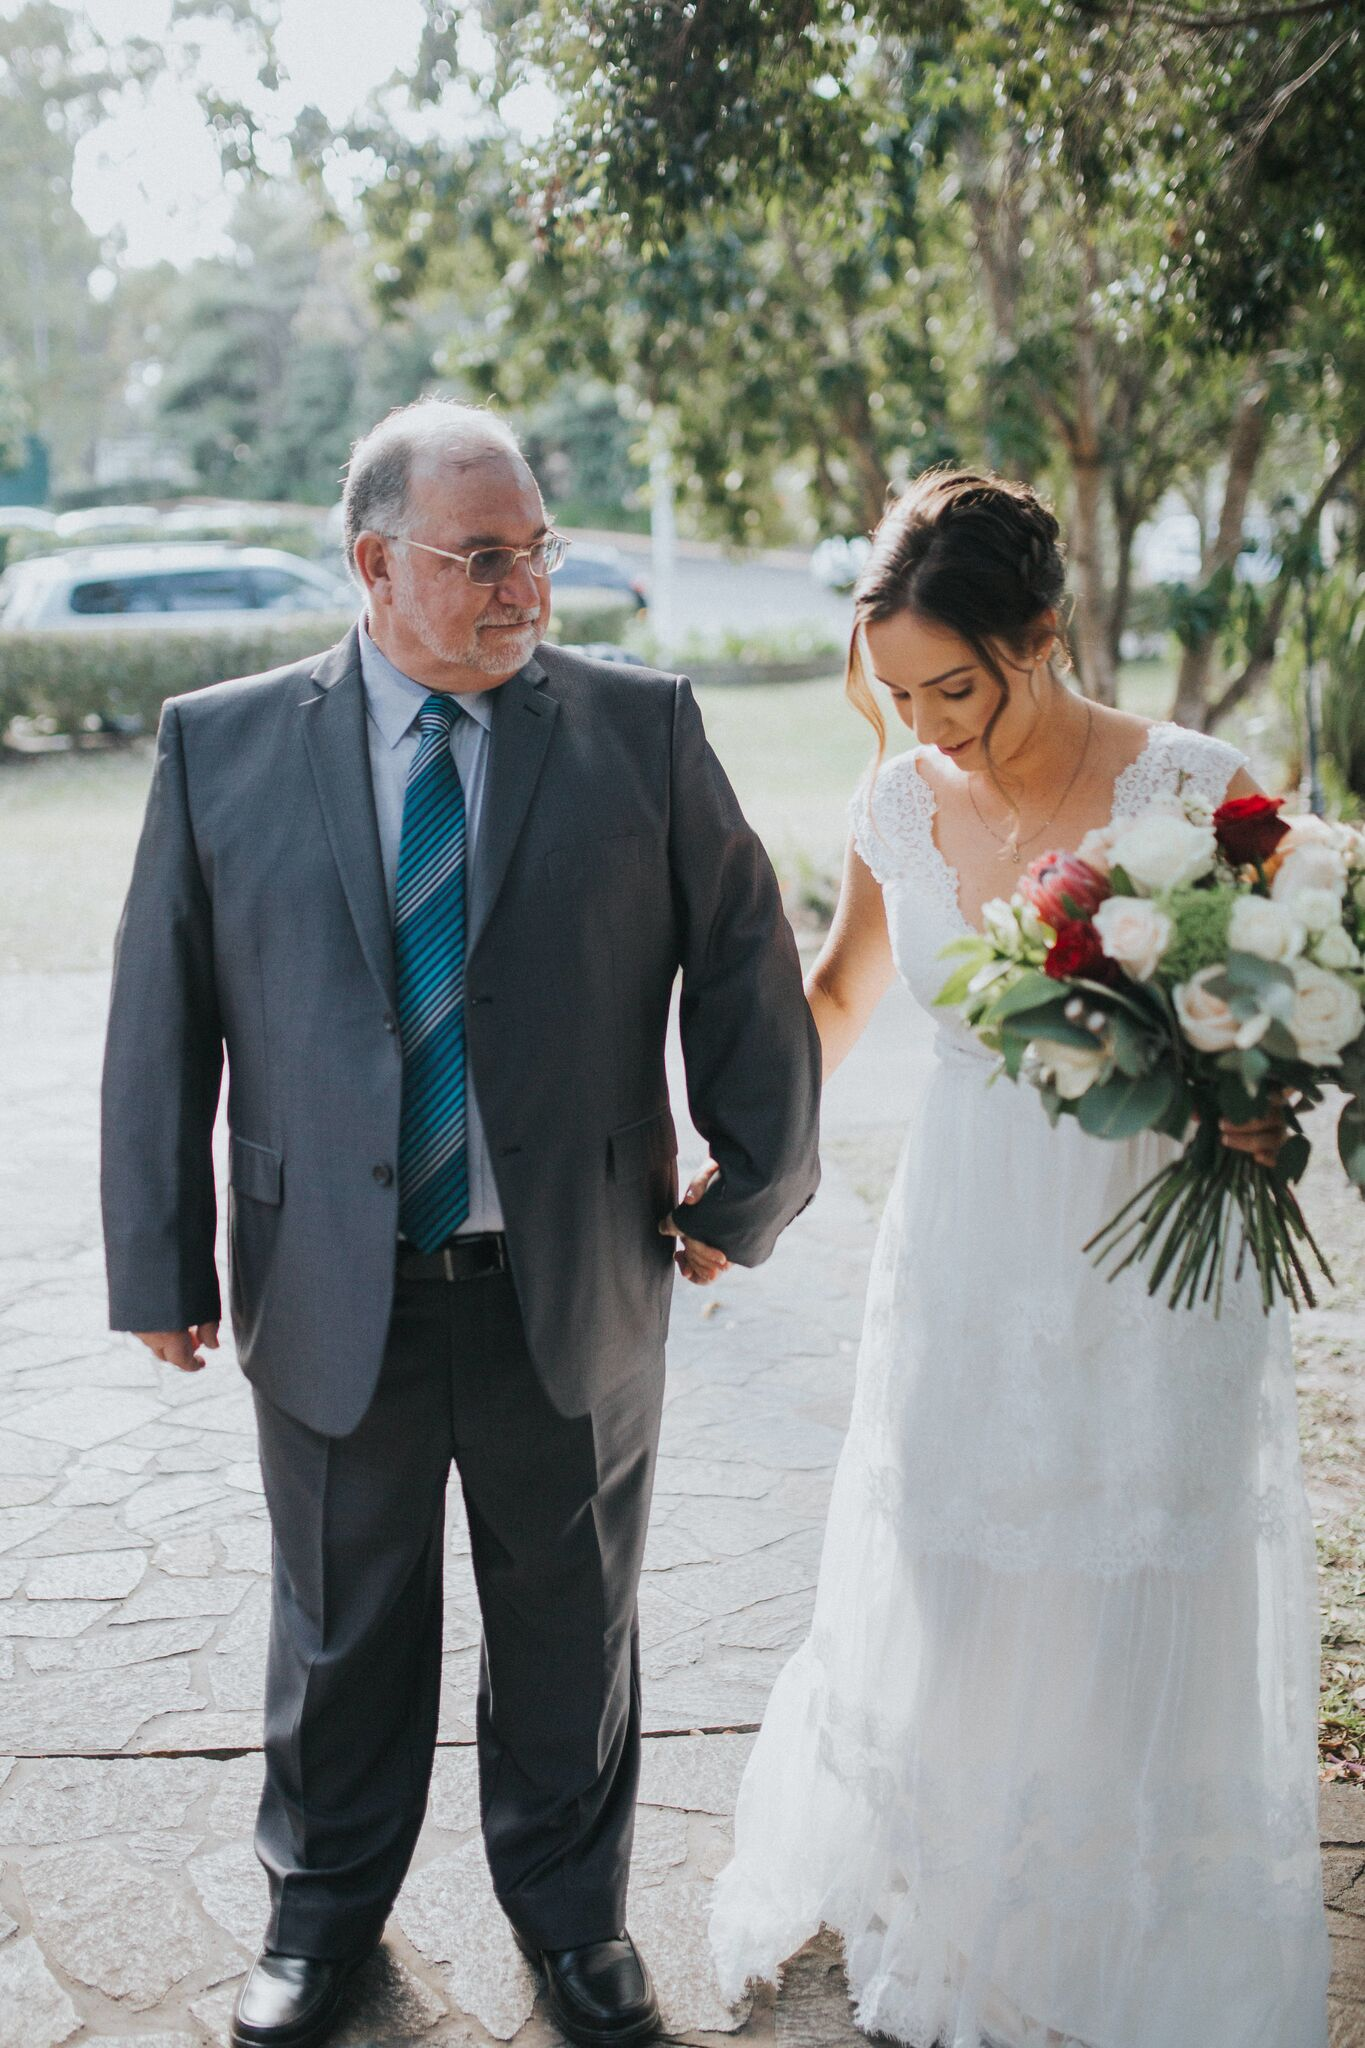 Trost_wedding_highres_227_preview.jpeg